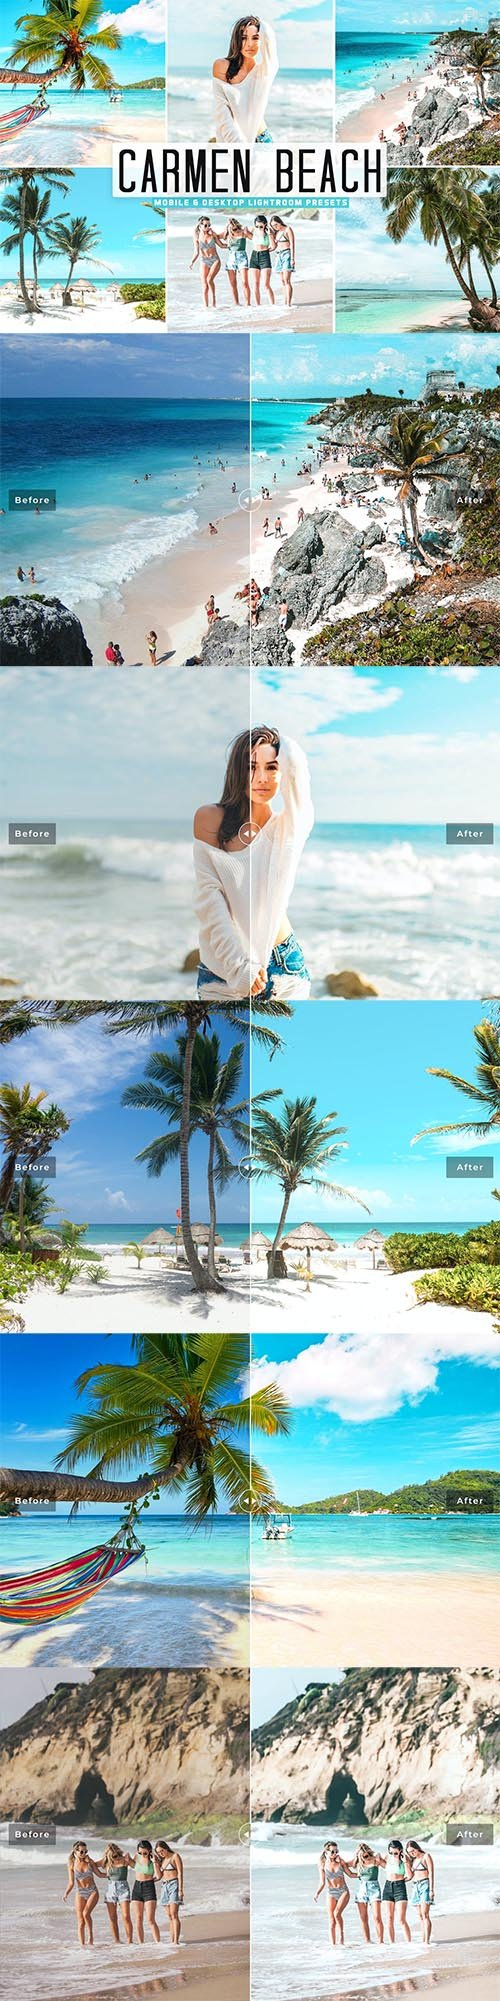 Carmen Beach Mobile & Desktop Lightroom Presets